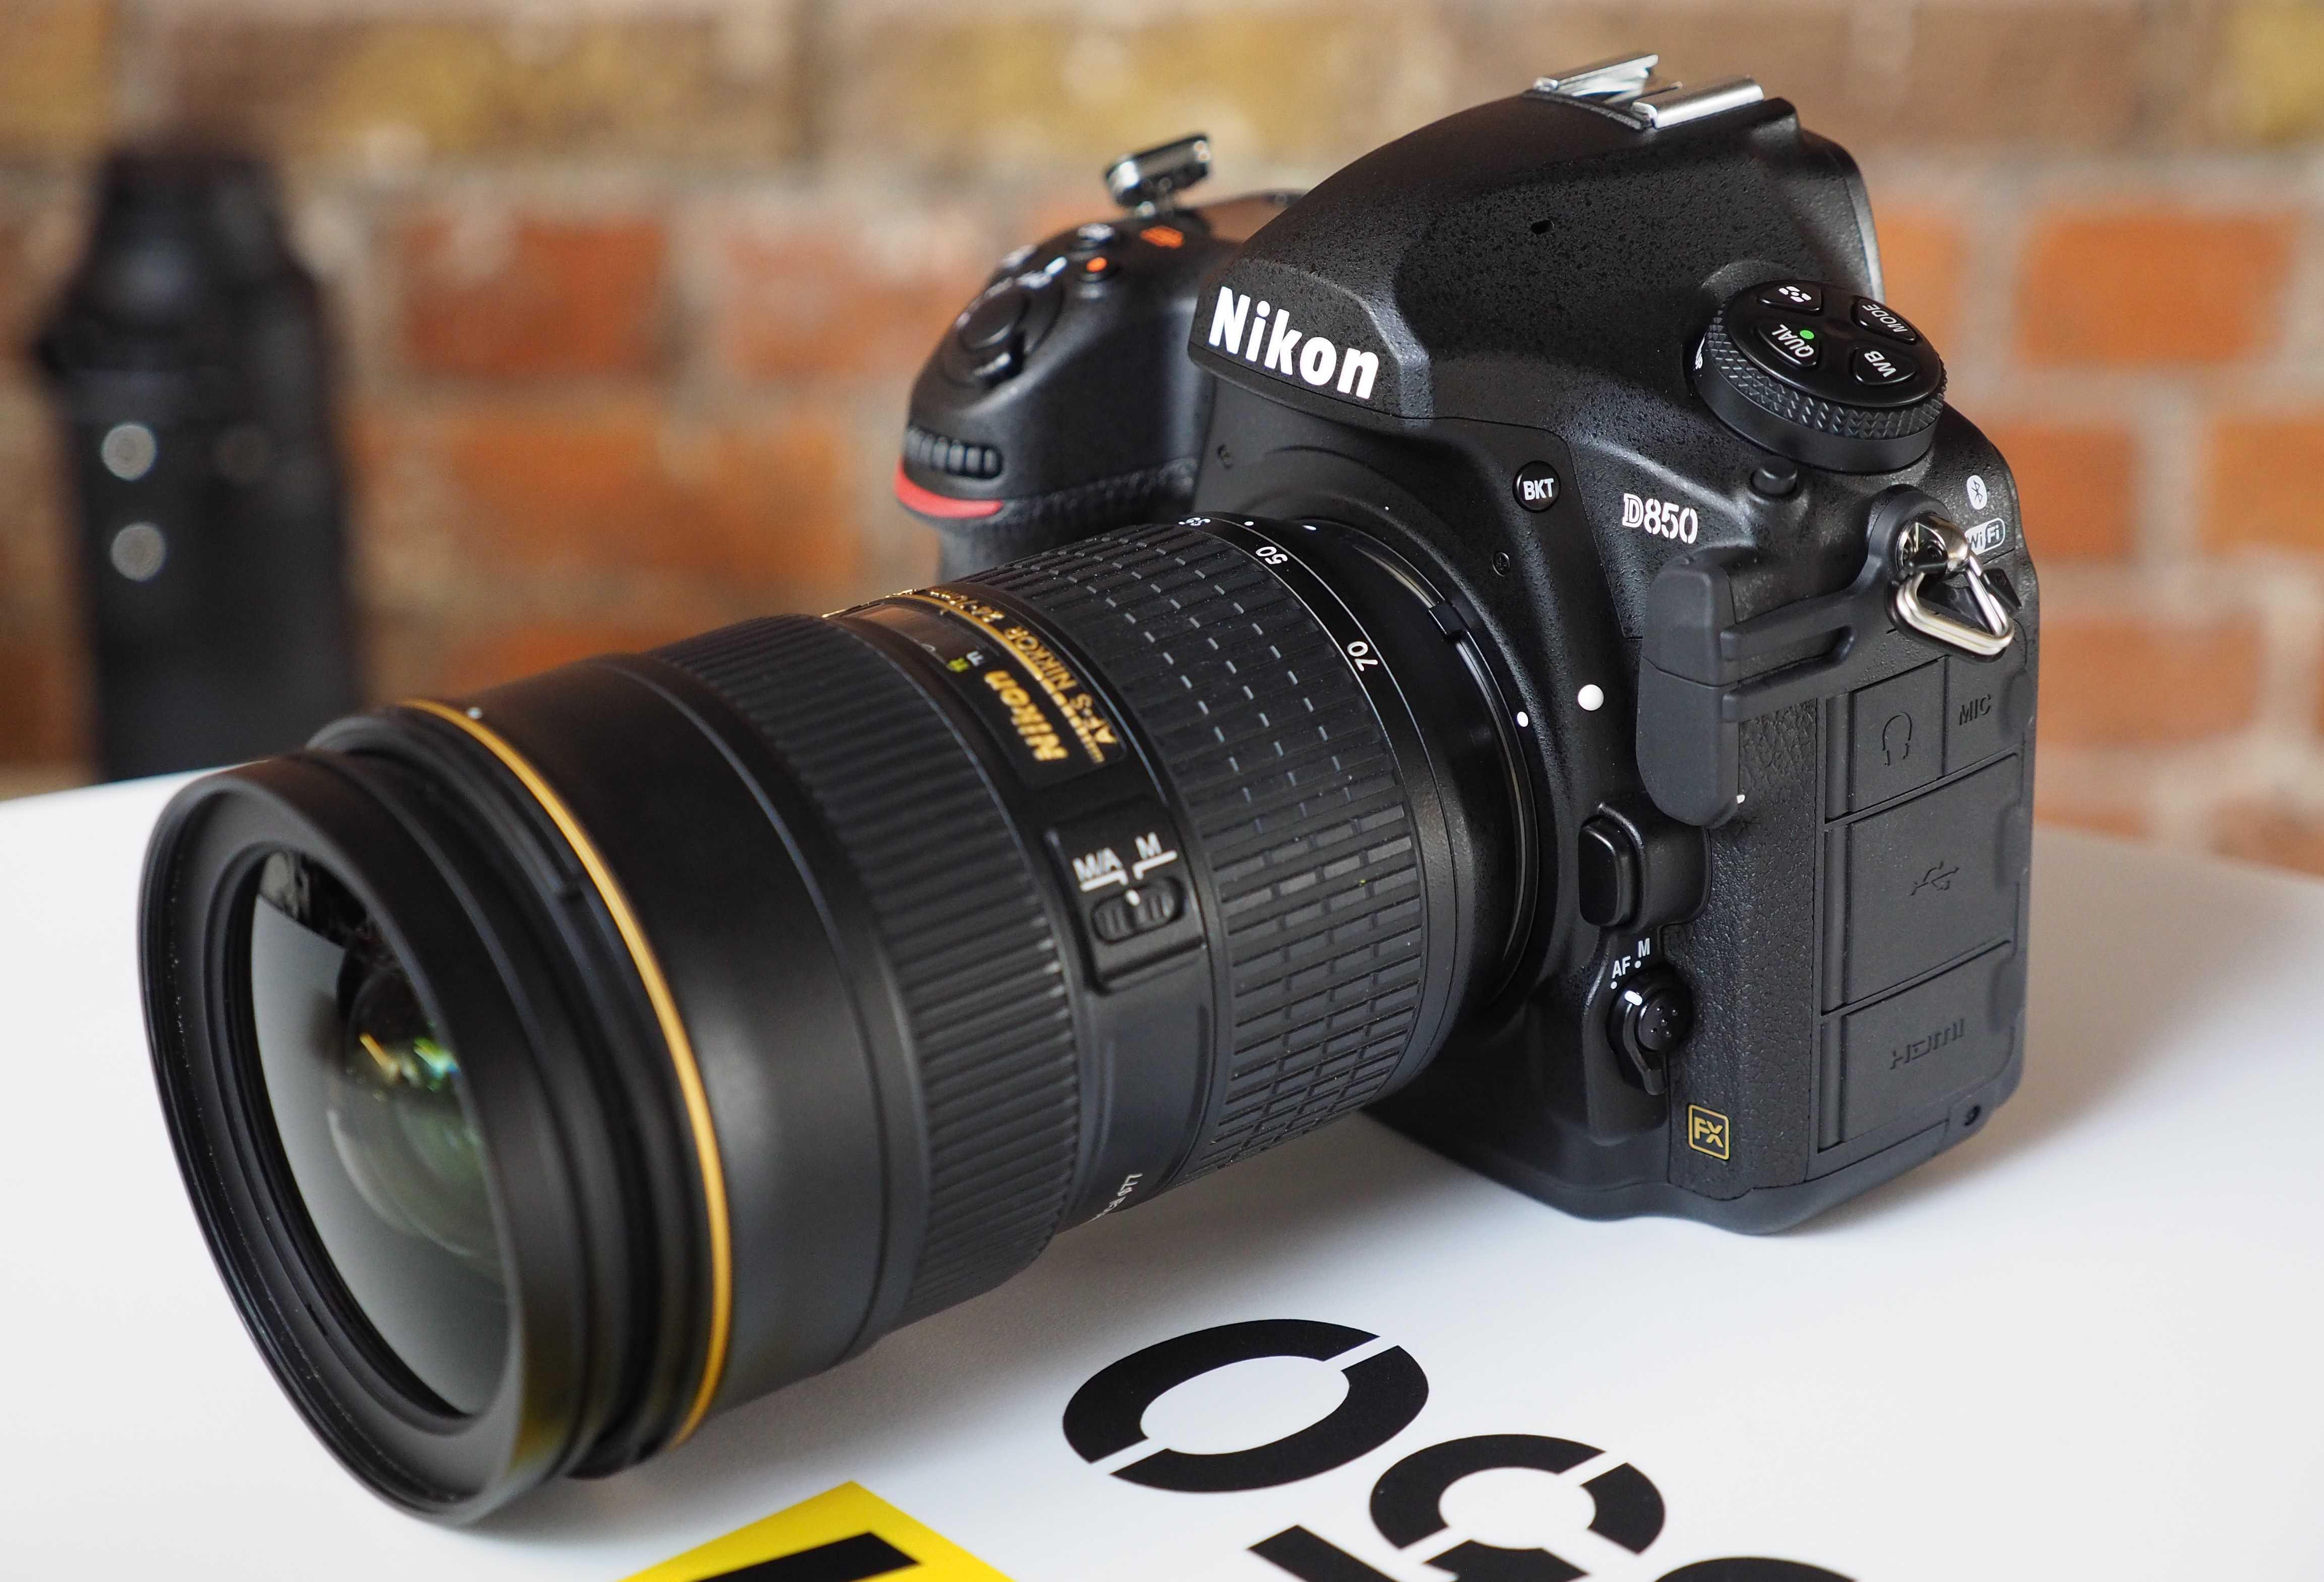 Размер матрицы и угол обзора объектива фотоаппарата